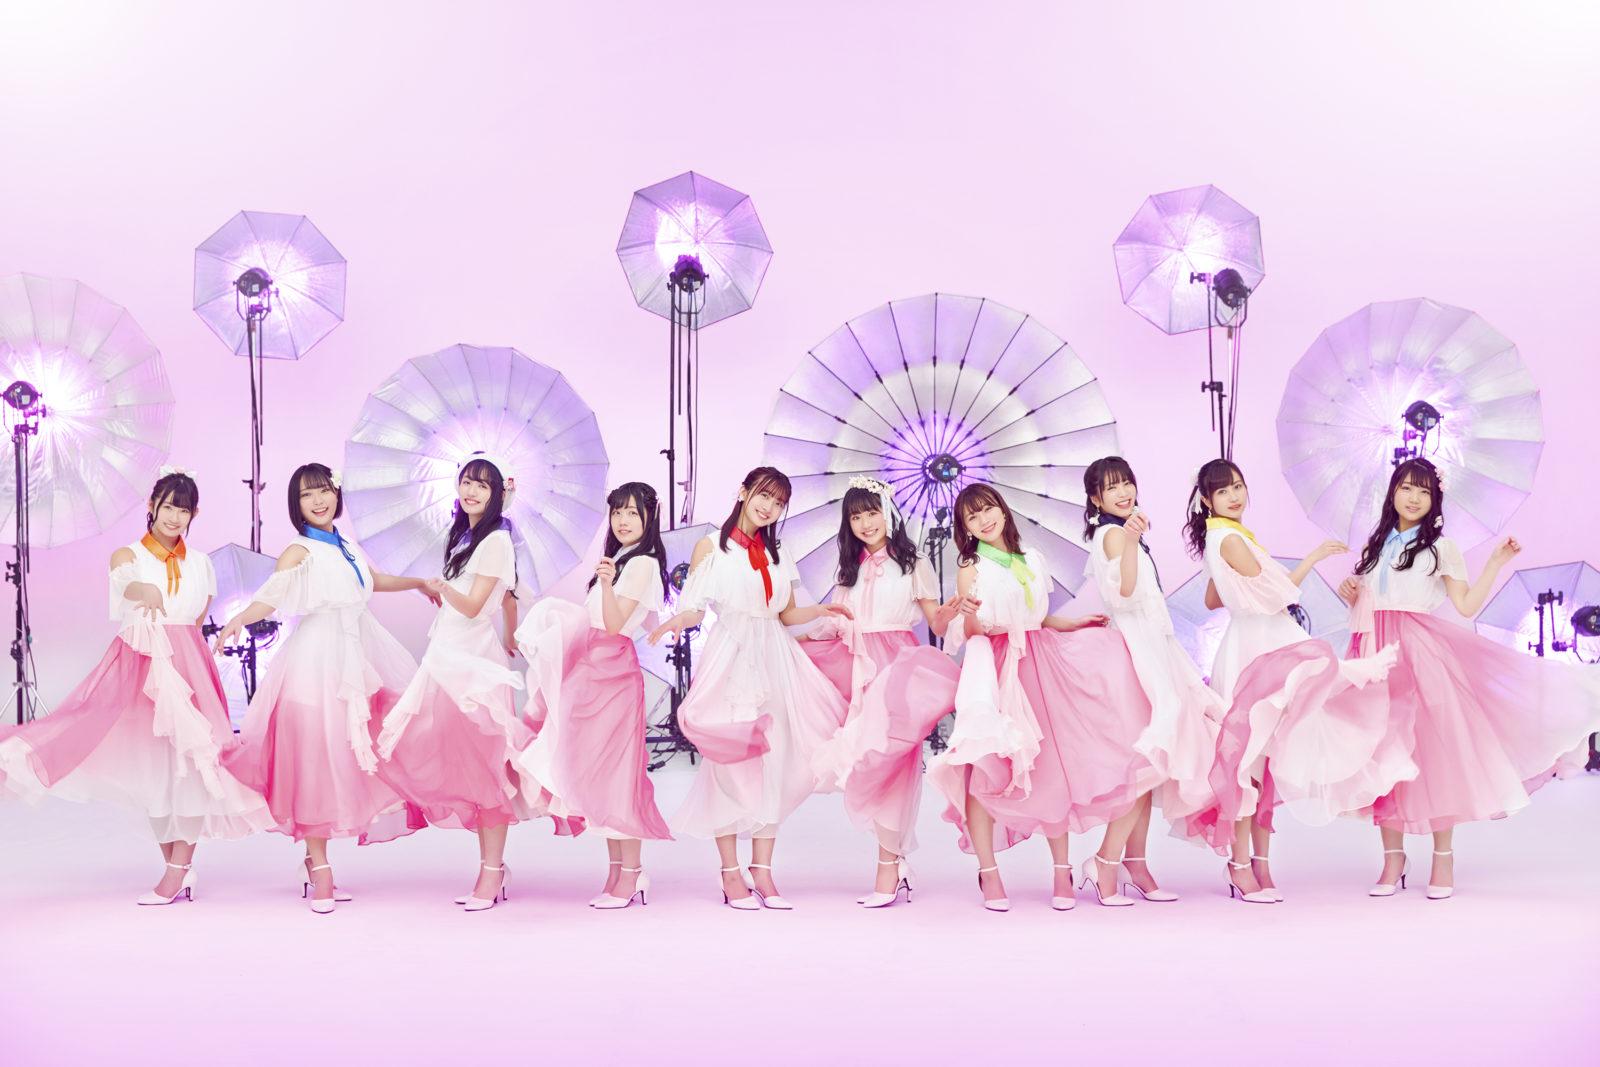 SUPER☆GiRLSの新曲「忘れ桜」がオリコンデイリーシングルランキング1位を獲得サムネイル画像